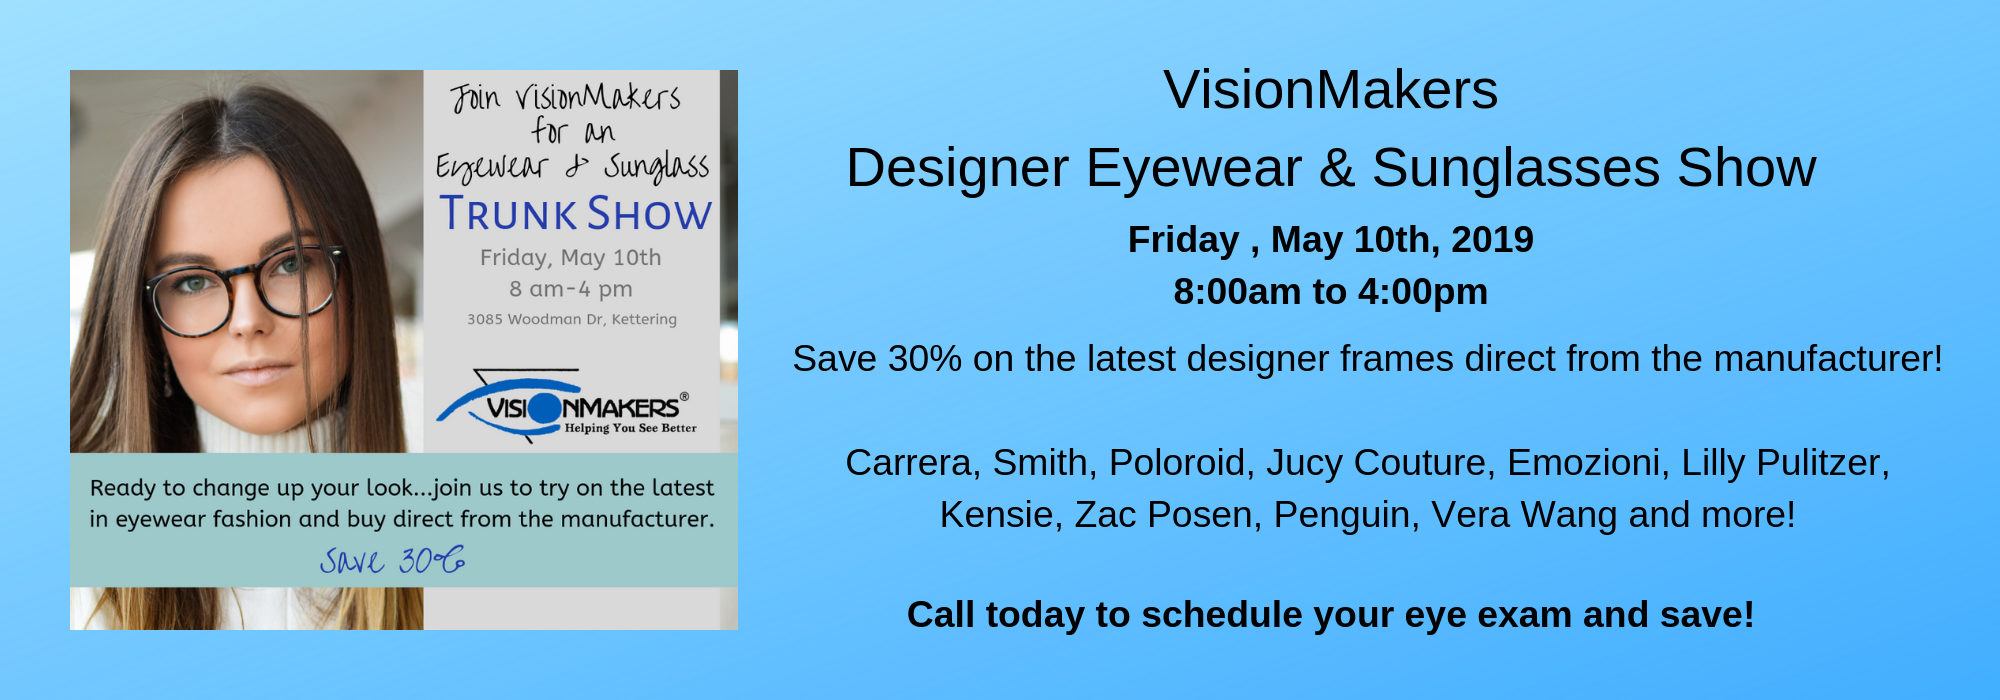 VisionMakers-Designer-Eyewear-Sunglasses-Show.png